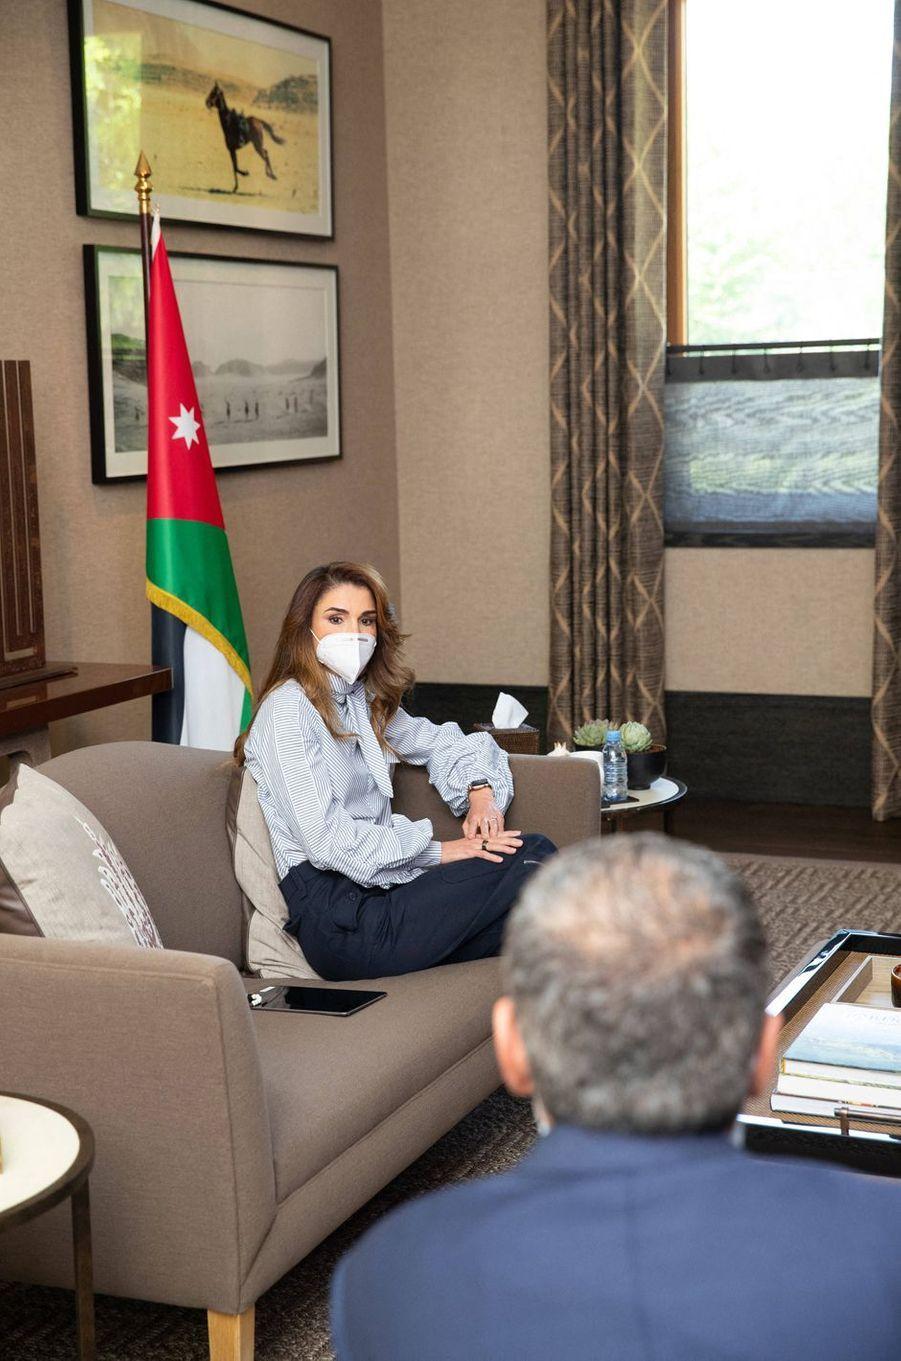 La reine Rania de Jordanie, le 8 juin 2020 à Amman